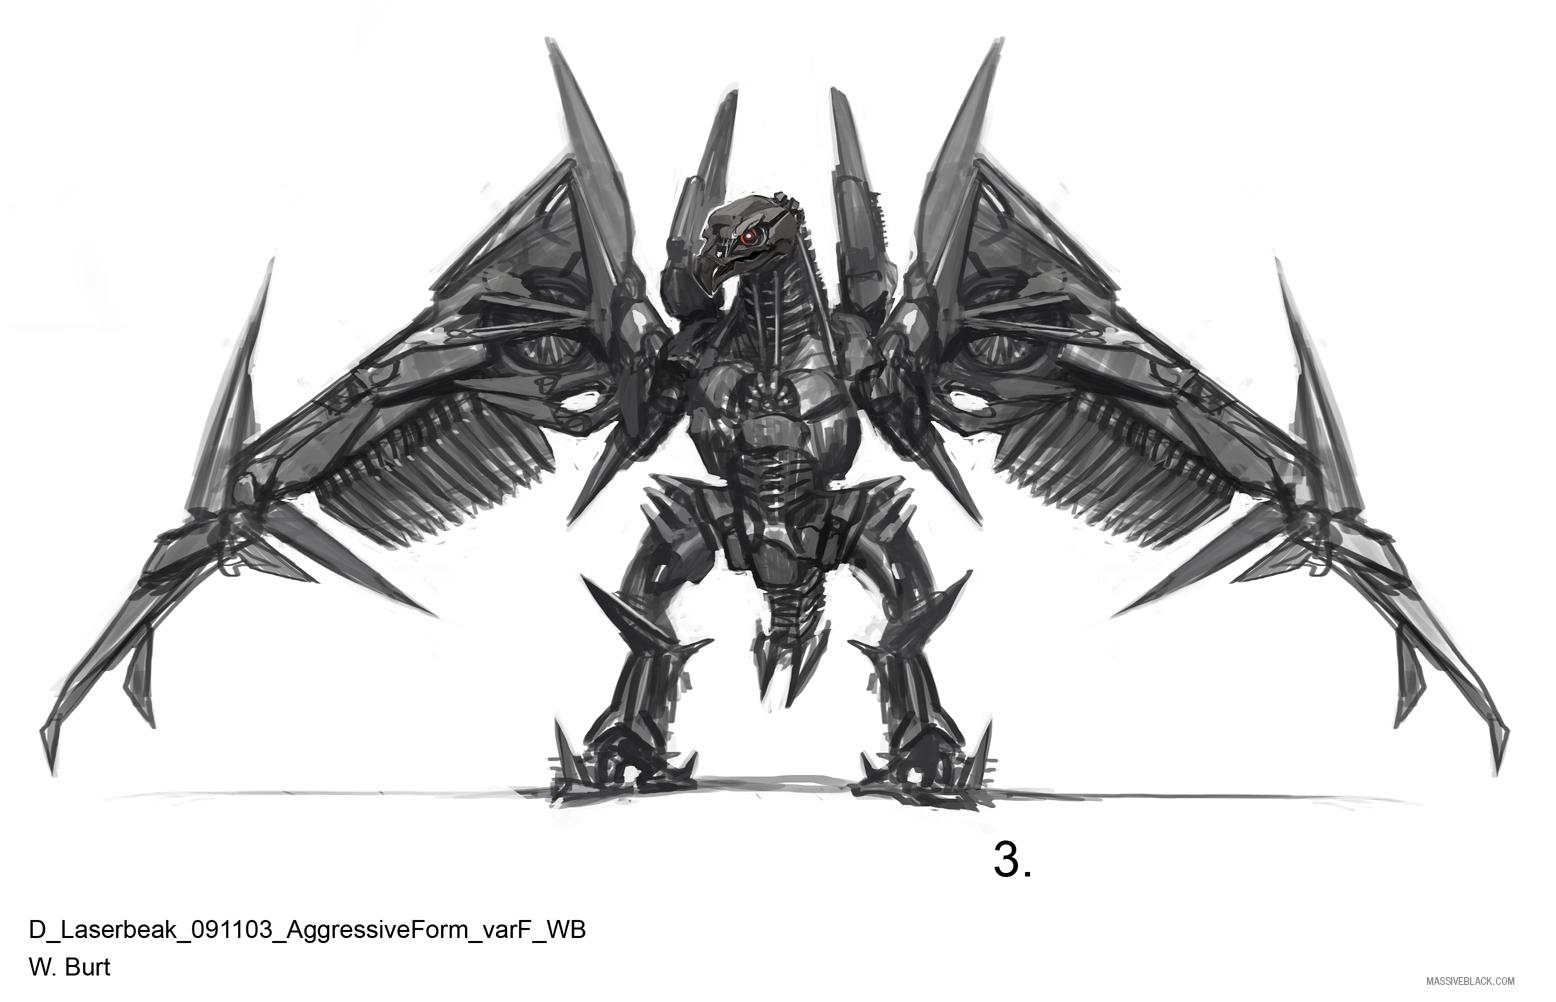 Massive Black Transformers Dark Of The Moon Concept Art